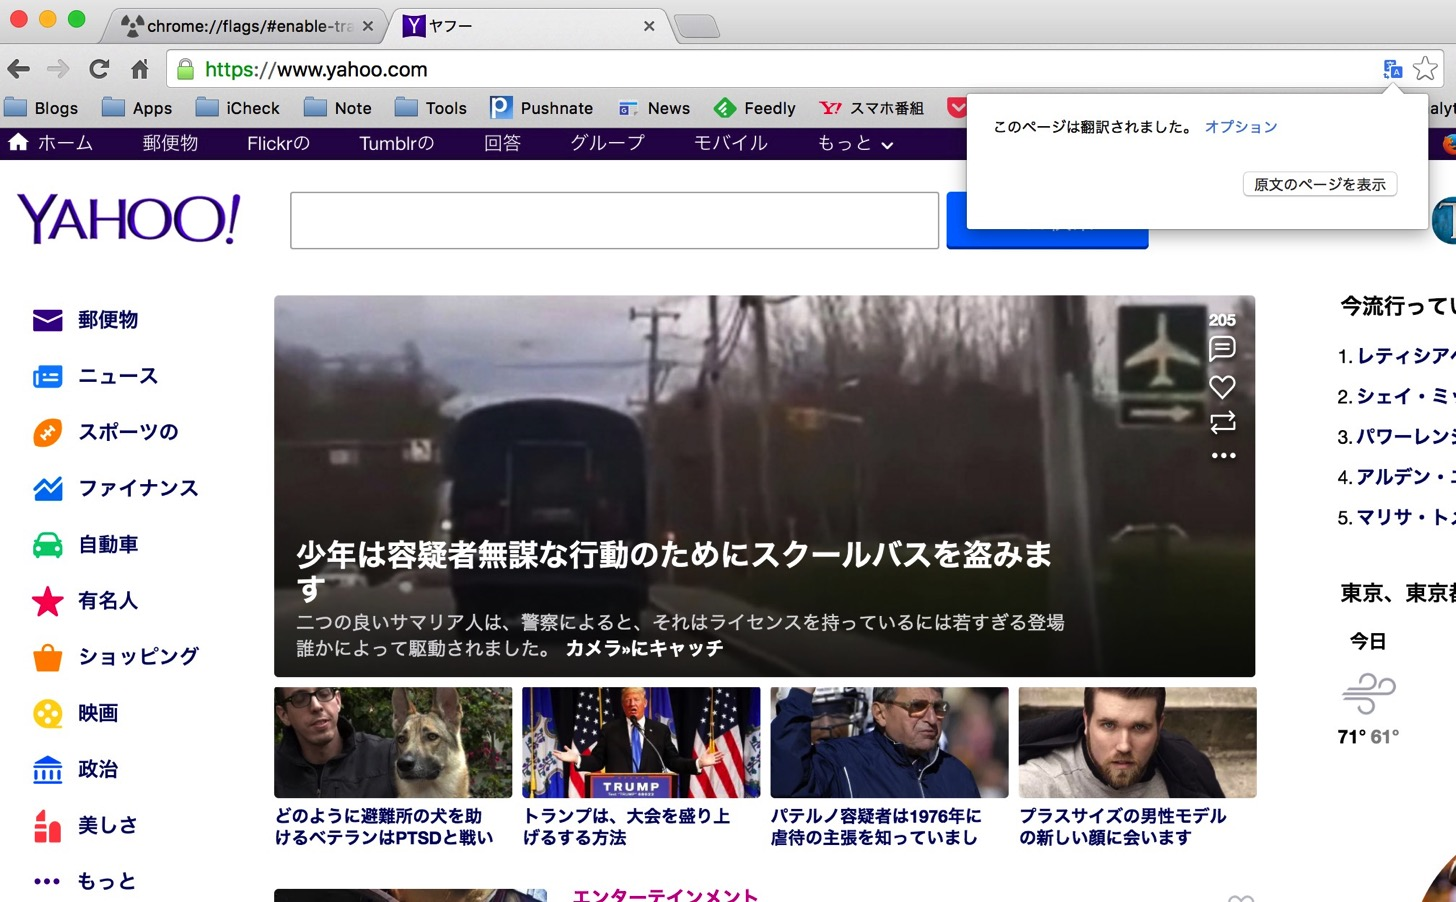 Google Chromeの隠し機能「新しい翻訳エクスペリエンス」